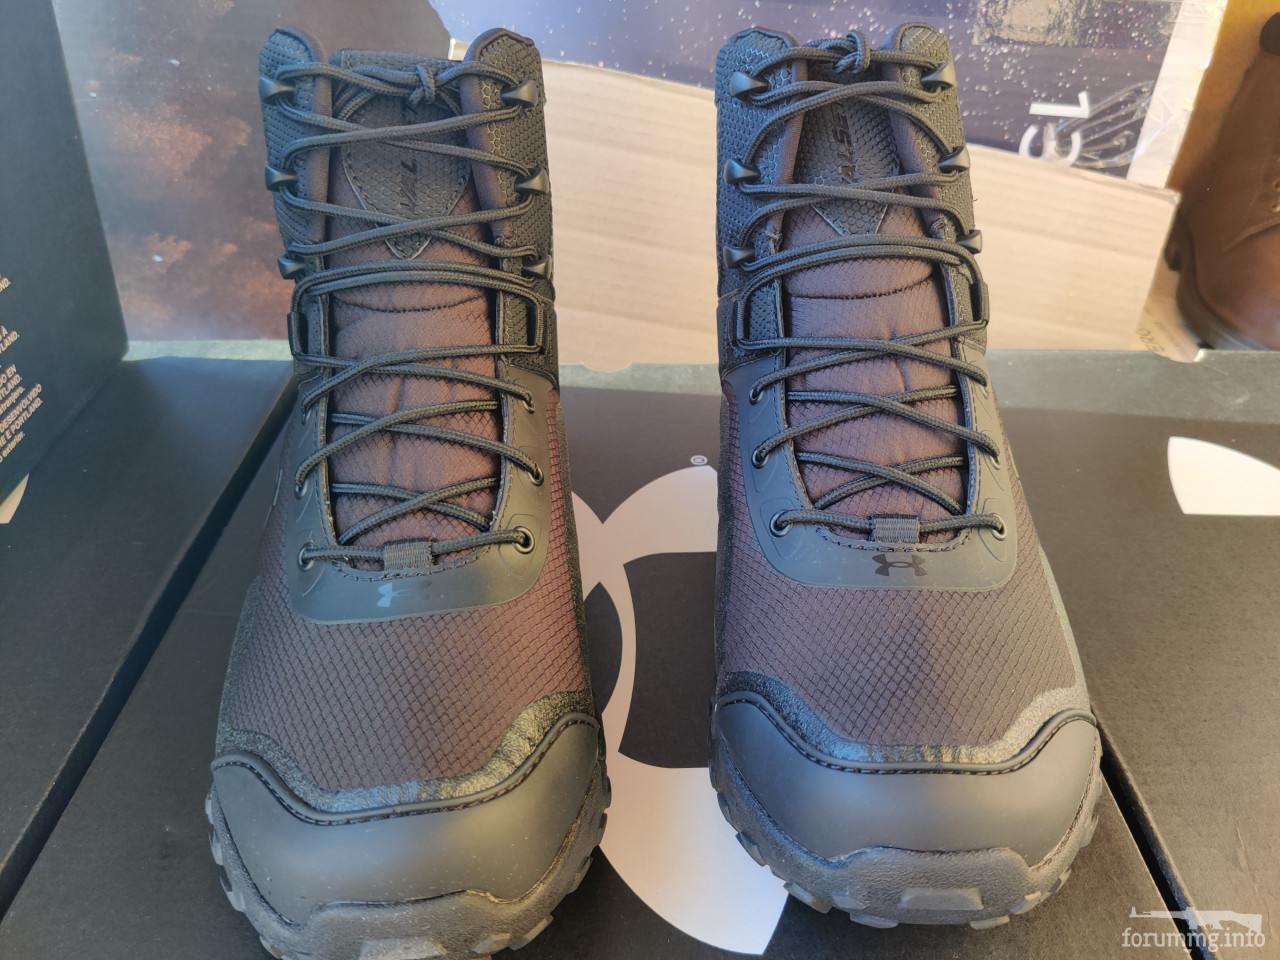 138690 - Under Armour Valsetz Boots (Under Armour Tactical Boots) 40-47р